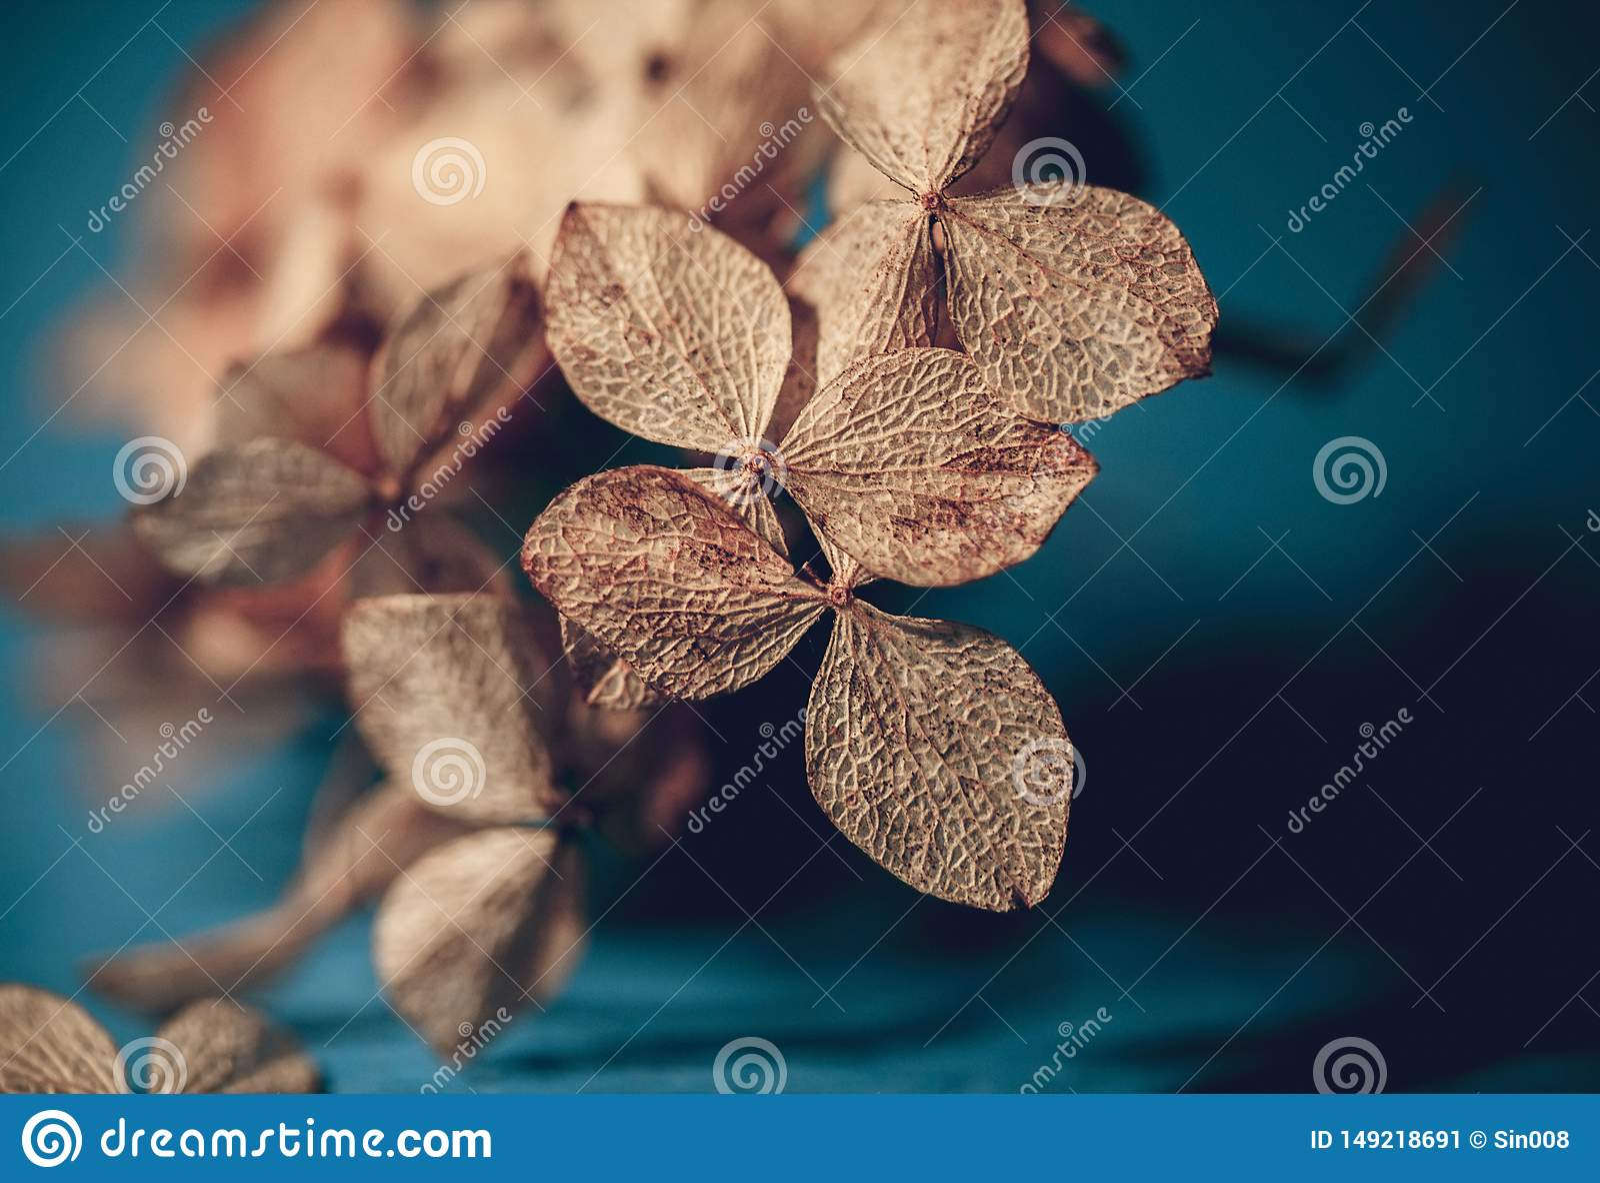 Dry textured hydrangea petals on a dark blue background close-up. Dried flowers hydrangea. Potpourri macro. Selective focus